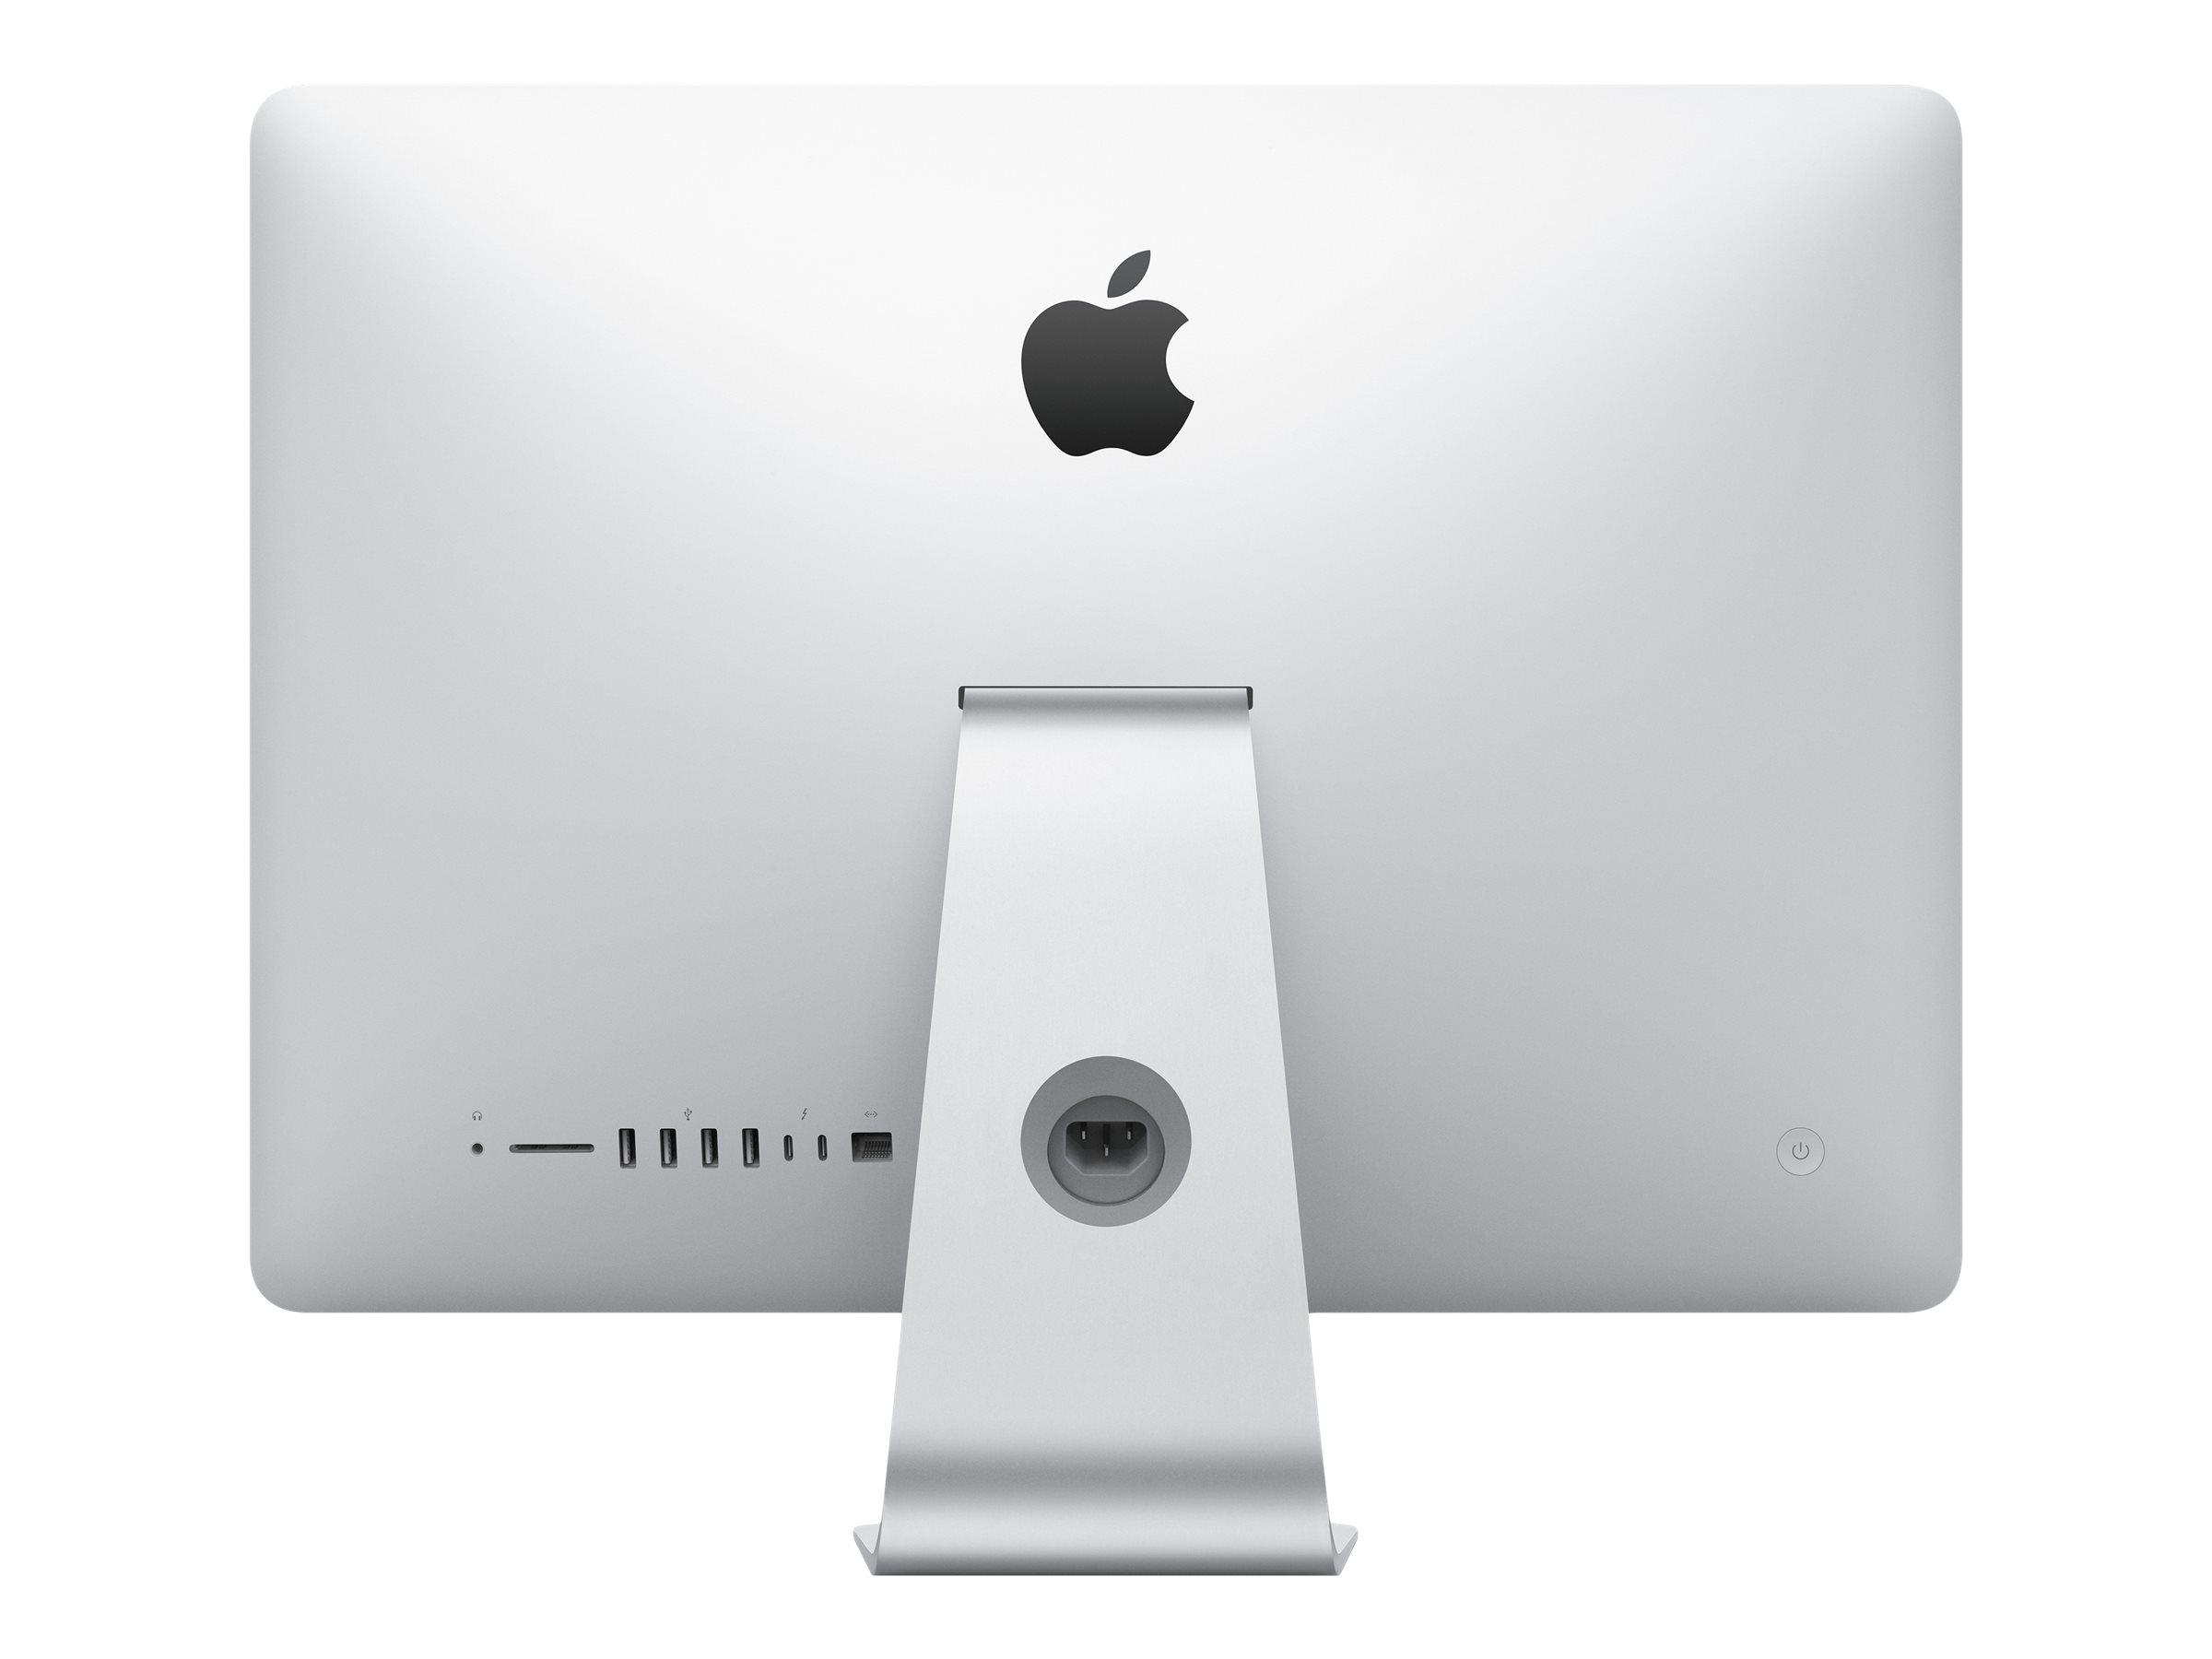 "Apple iMac - All-in-One (Komplettlösung) - Core i5 2.3 GHz - RAM 8 GB - SSD 256 GB - Iris Plus Graphics 640 - GigE - WLAN: 802.11a/b/g/n/ac, Bluetooth 4.2 - macOS Big Sur 11.0 - Monitor: LED 54.6 cm (21.5"")"